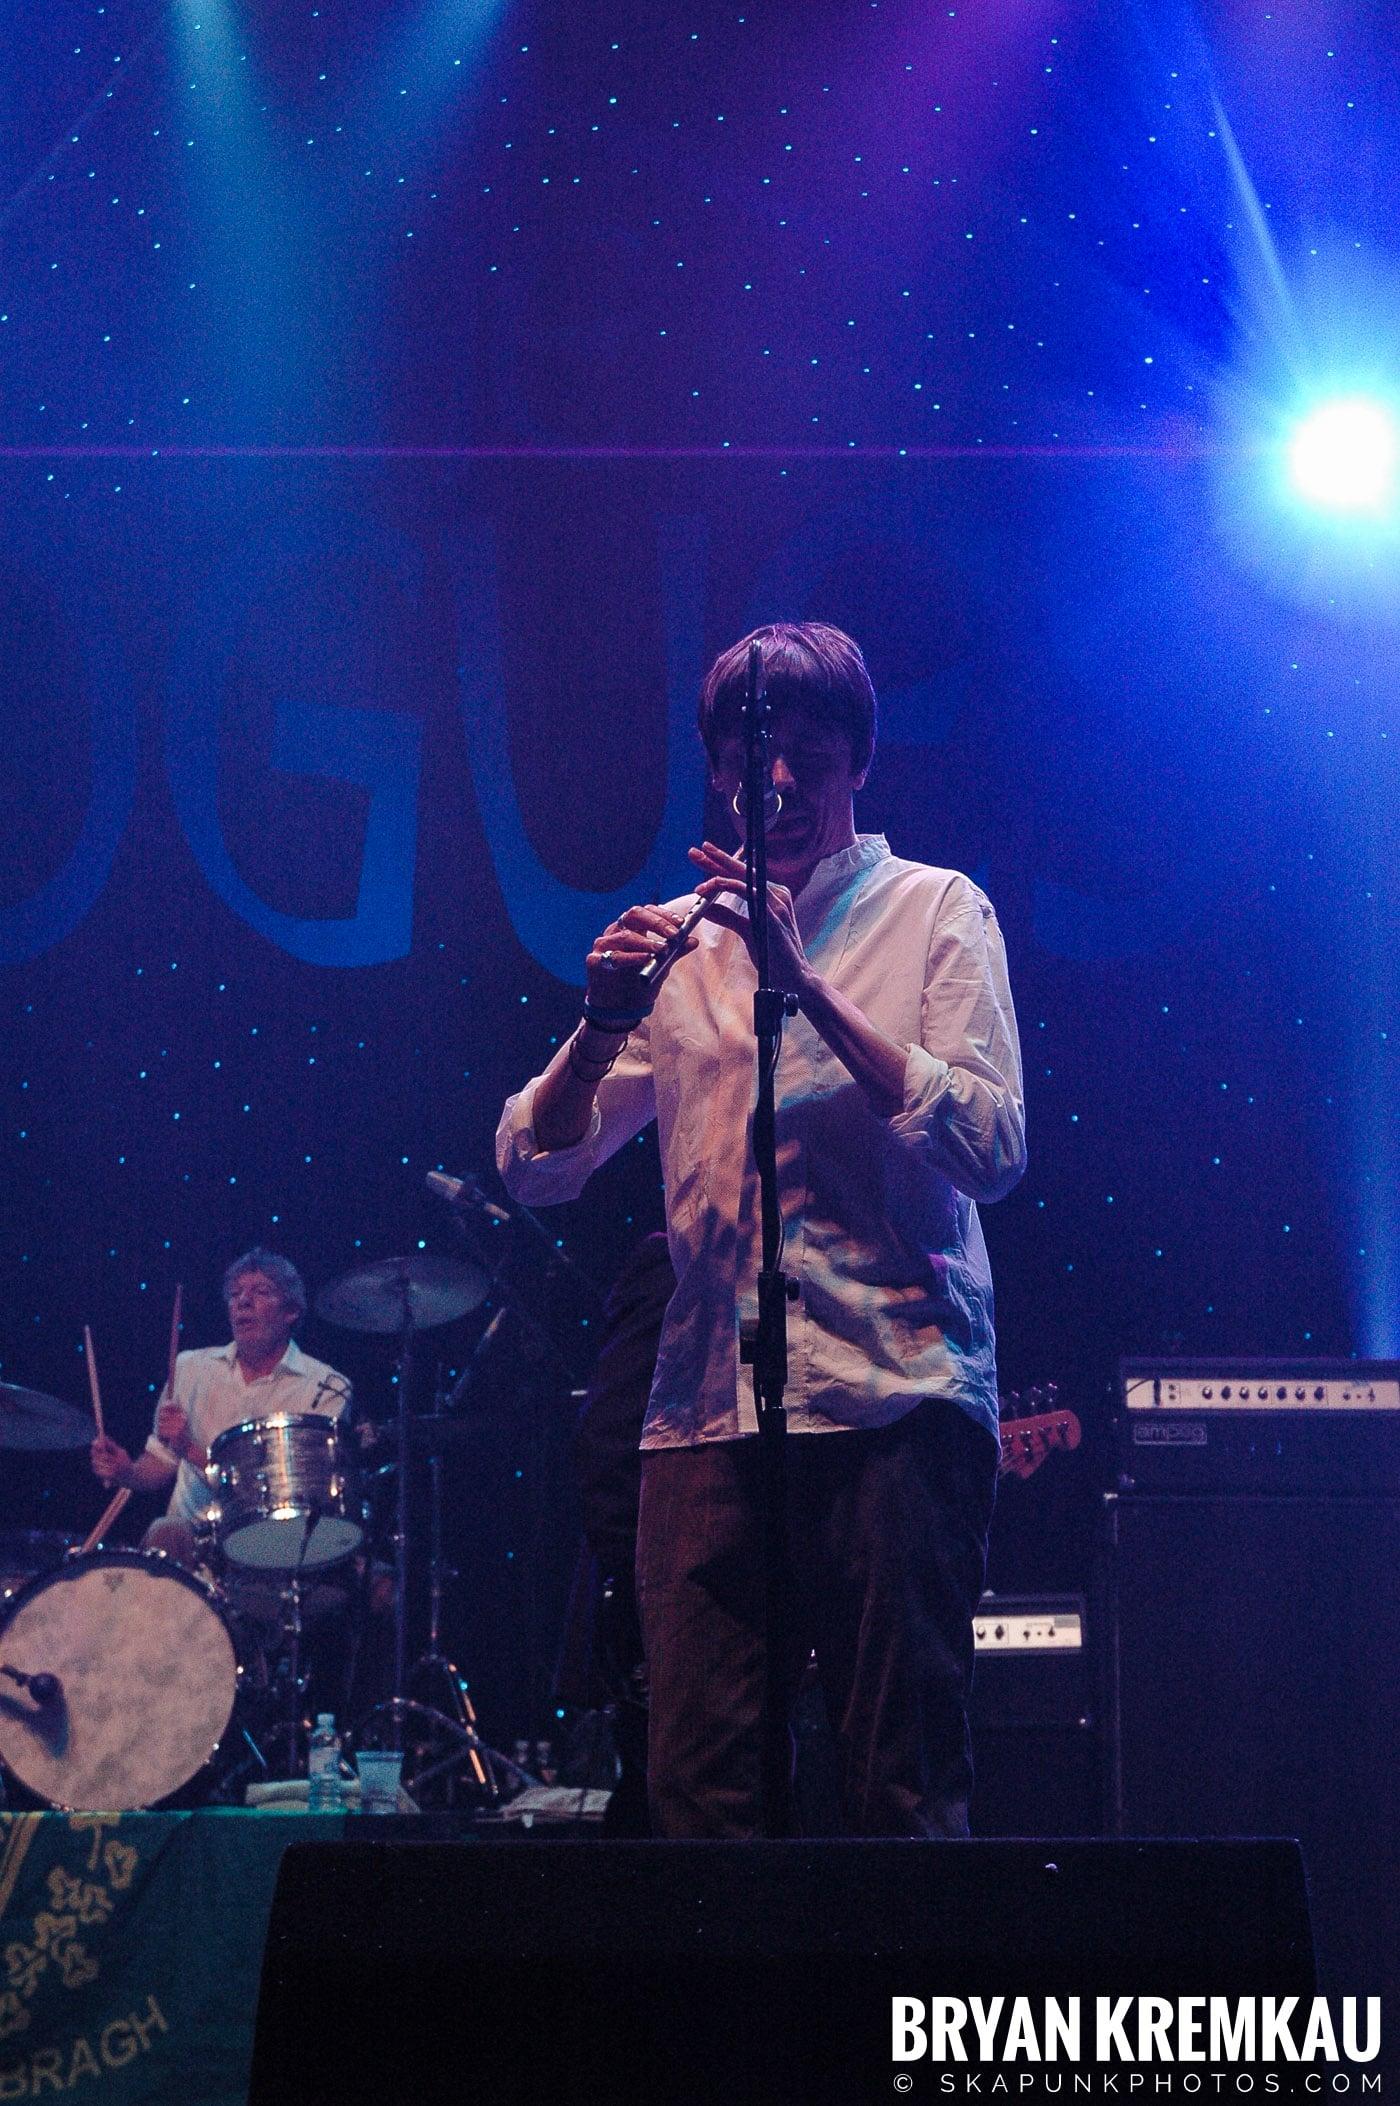 The Pogues @ Brixton Academy, London UK - 12.19.05 (9)